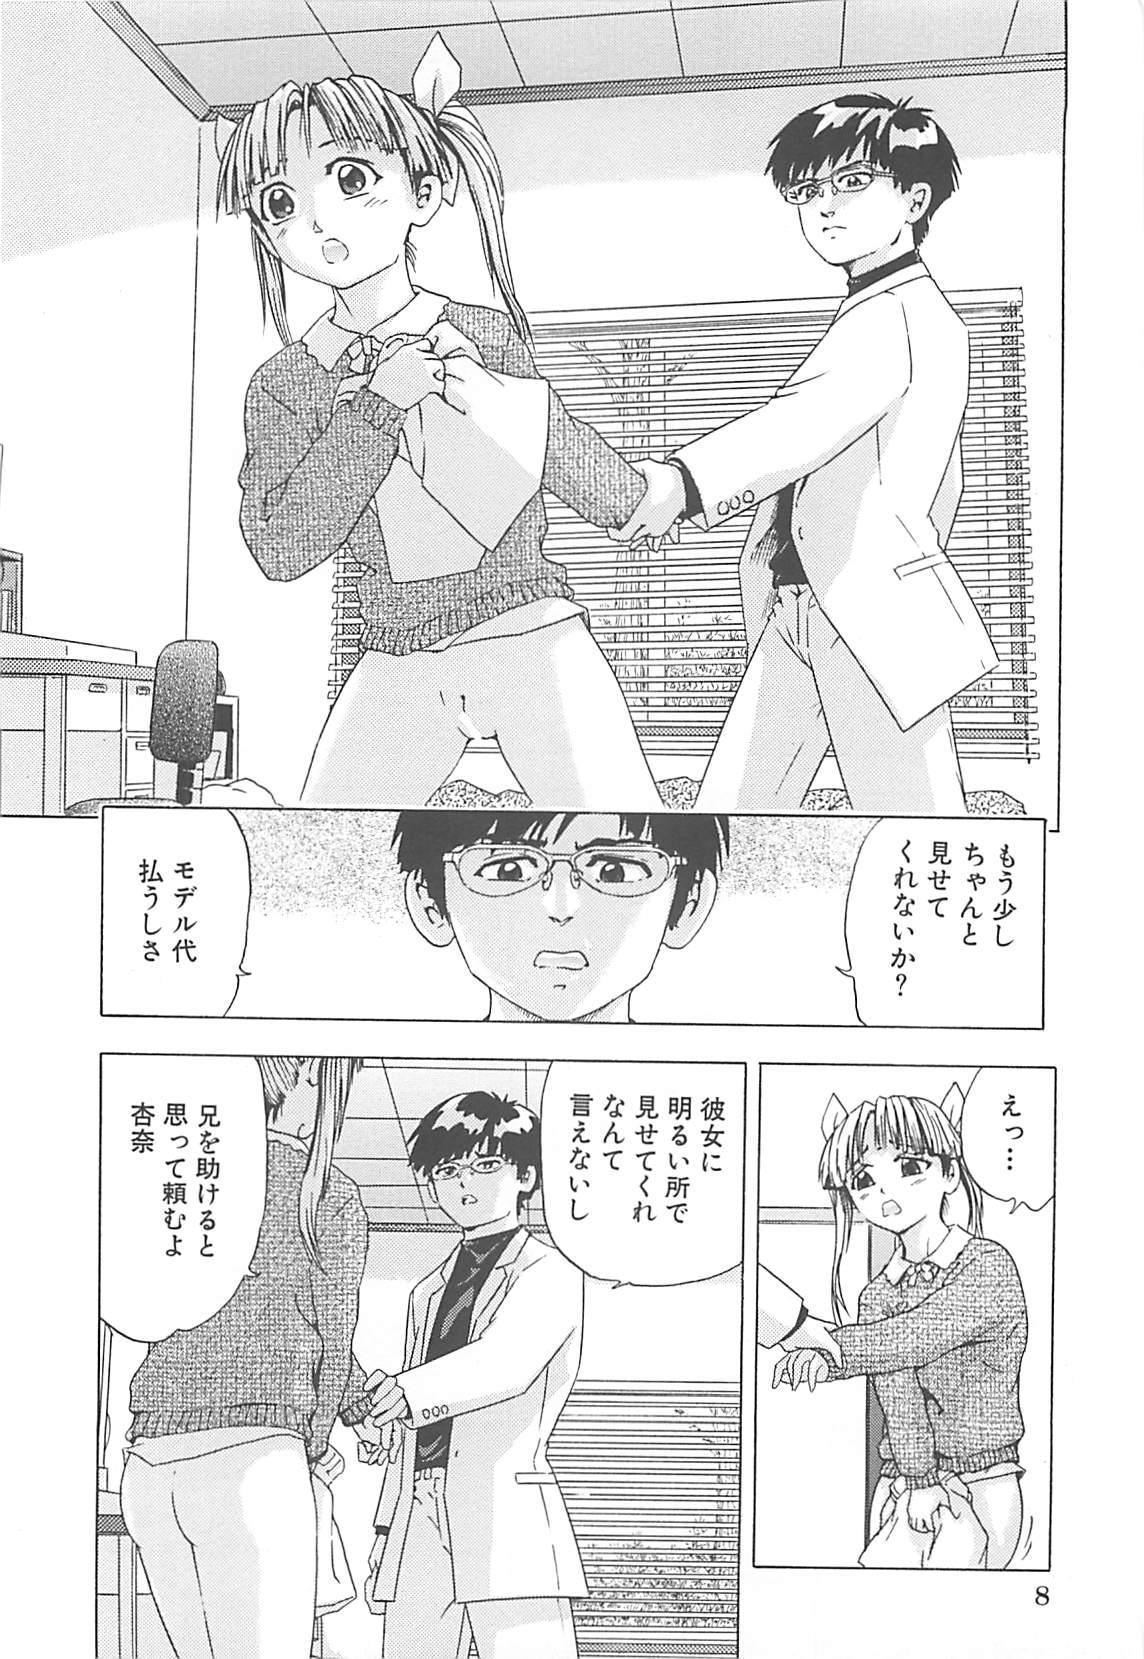 Kanin Kyoushitsu - Adultery Classroom 8